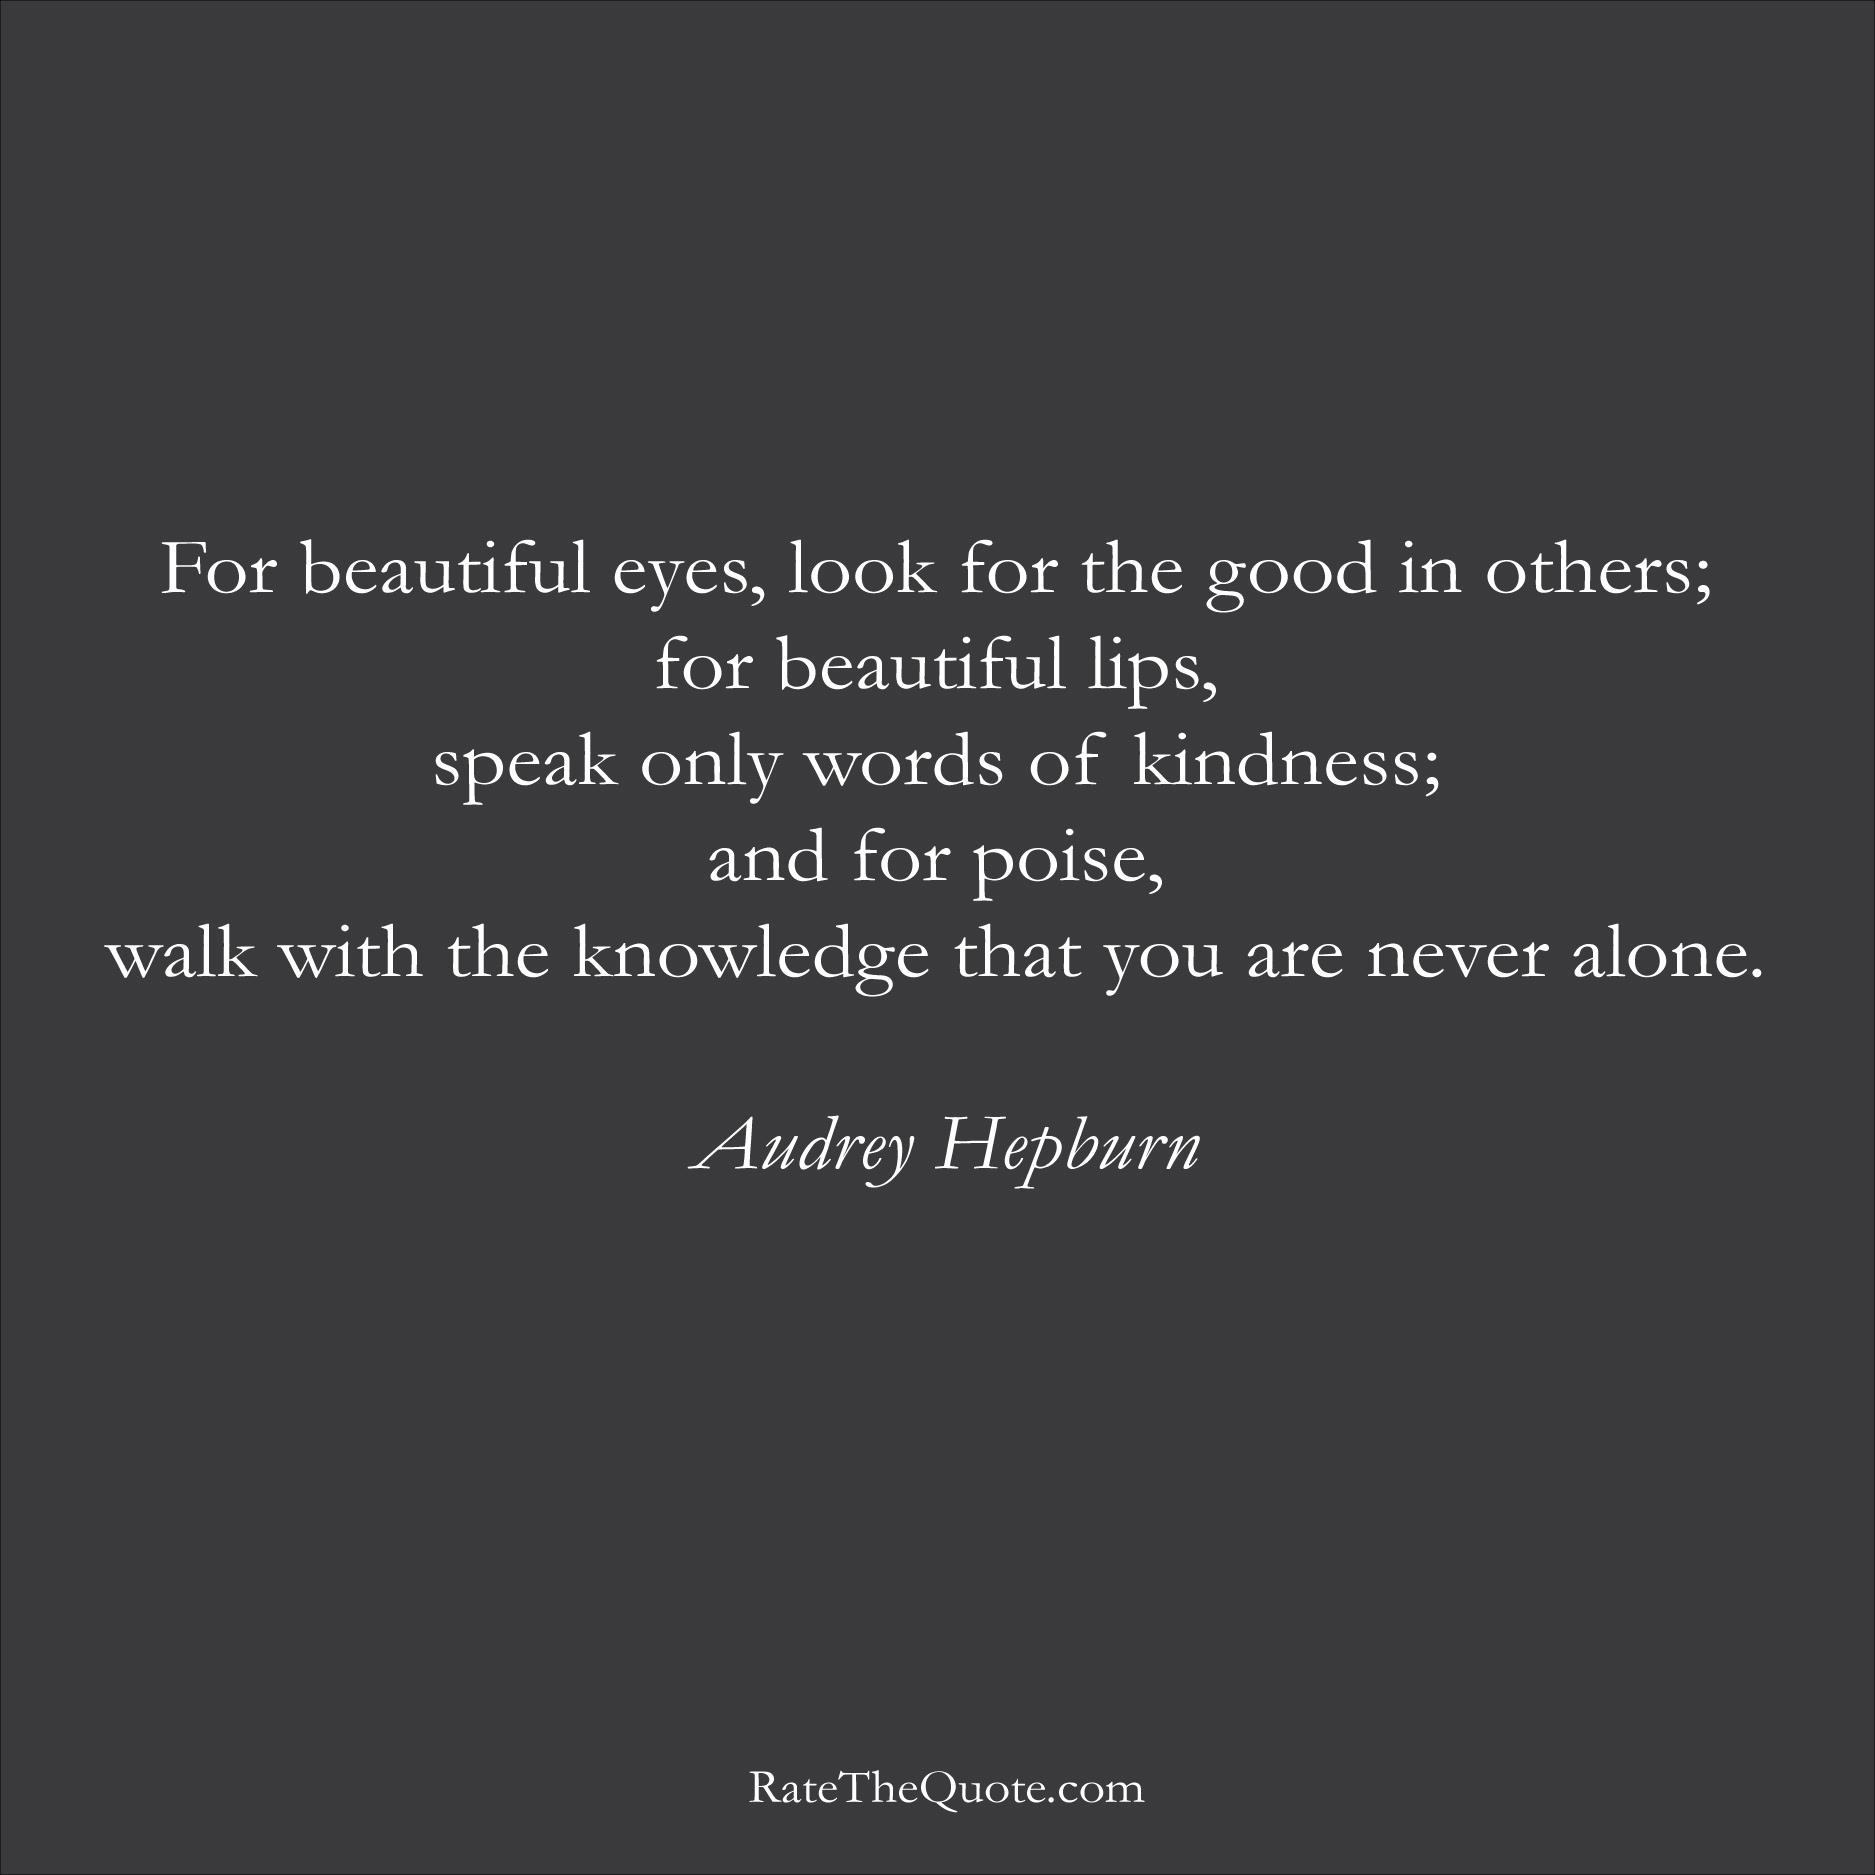 Audrey Hepburn Quotes Ratethequote